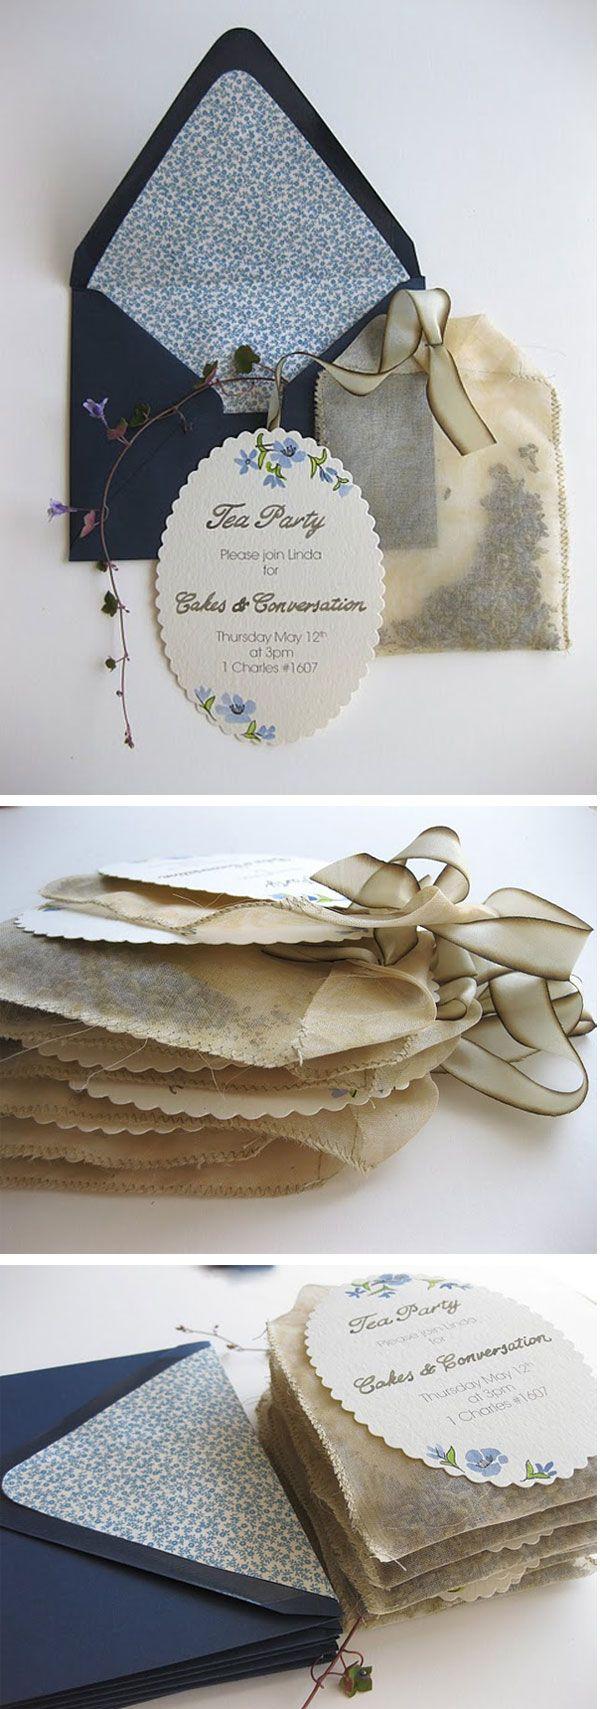 Cute invites office diy pinterest tea party invitations tea